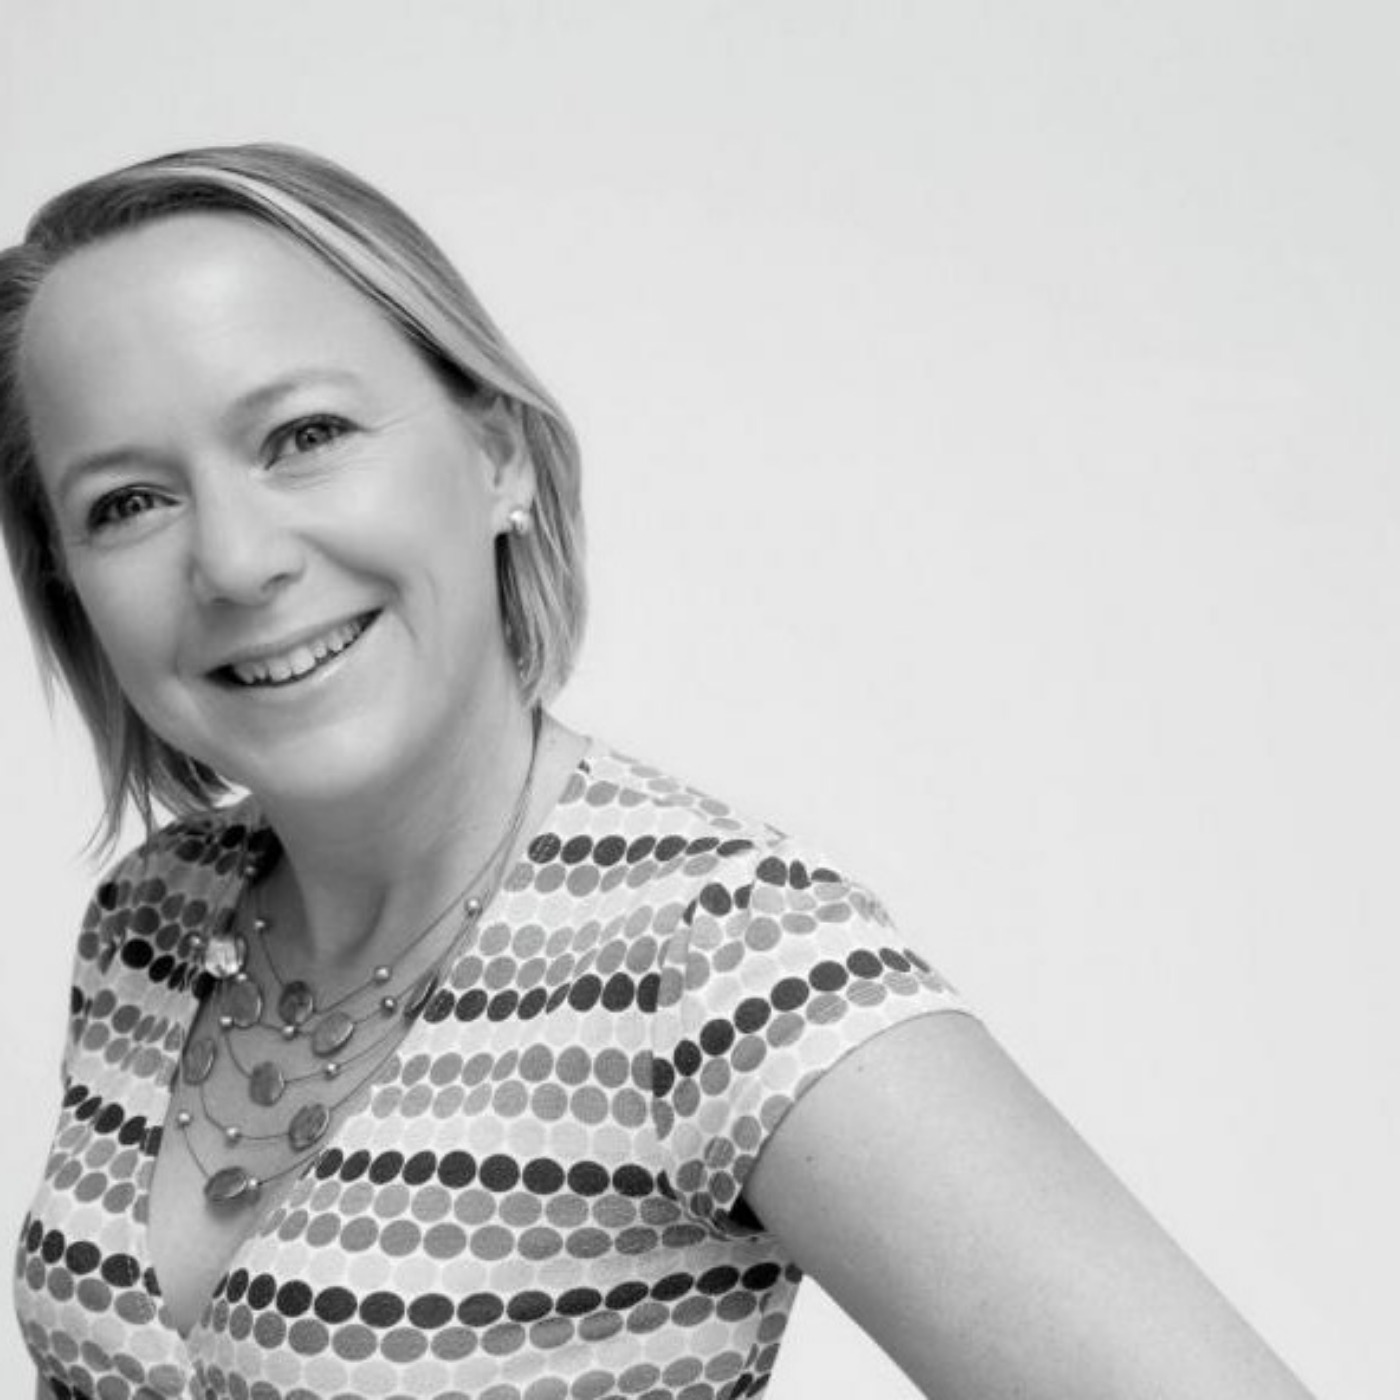 Épisode #51 - Christine Lewicki : J'arrête de râler ! Et je savoure la vie !